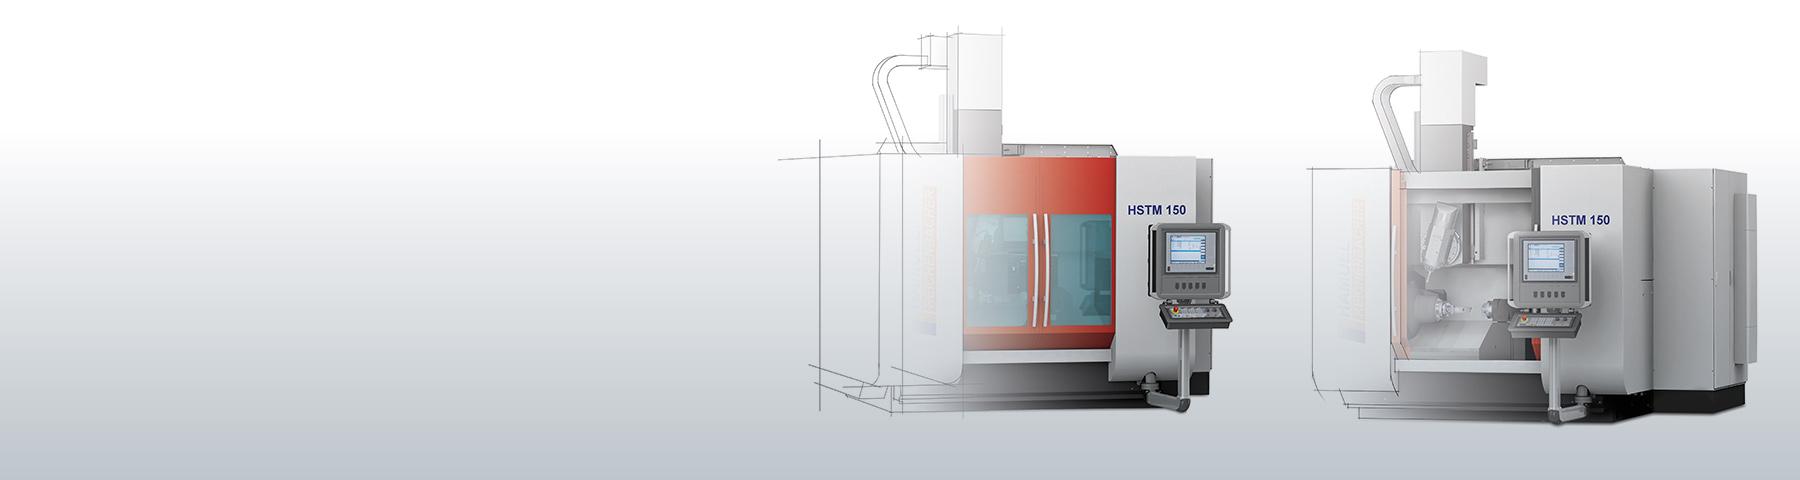 innocept engineering maschinenumhausung hamuel hstm 150. Black Bedroom Furniture Sets. Home Design Ideas